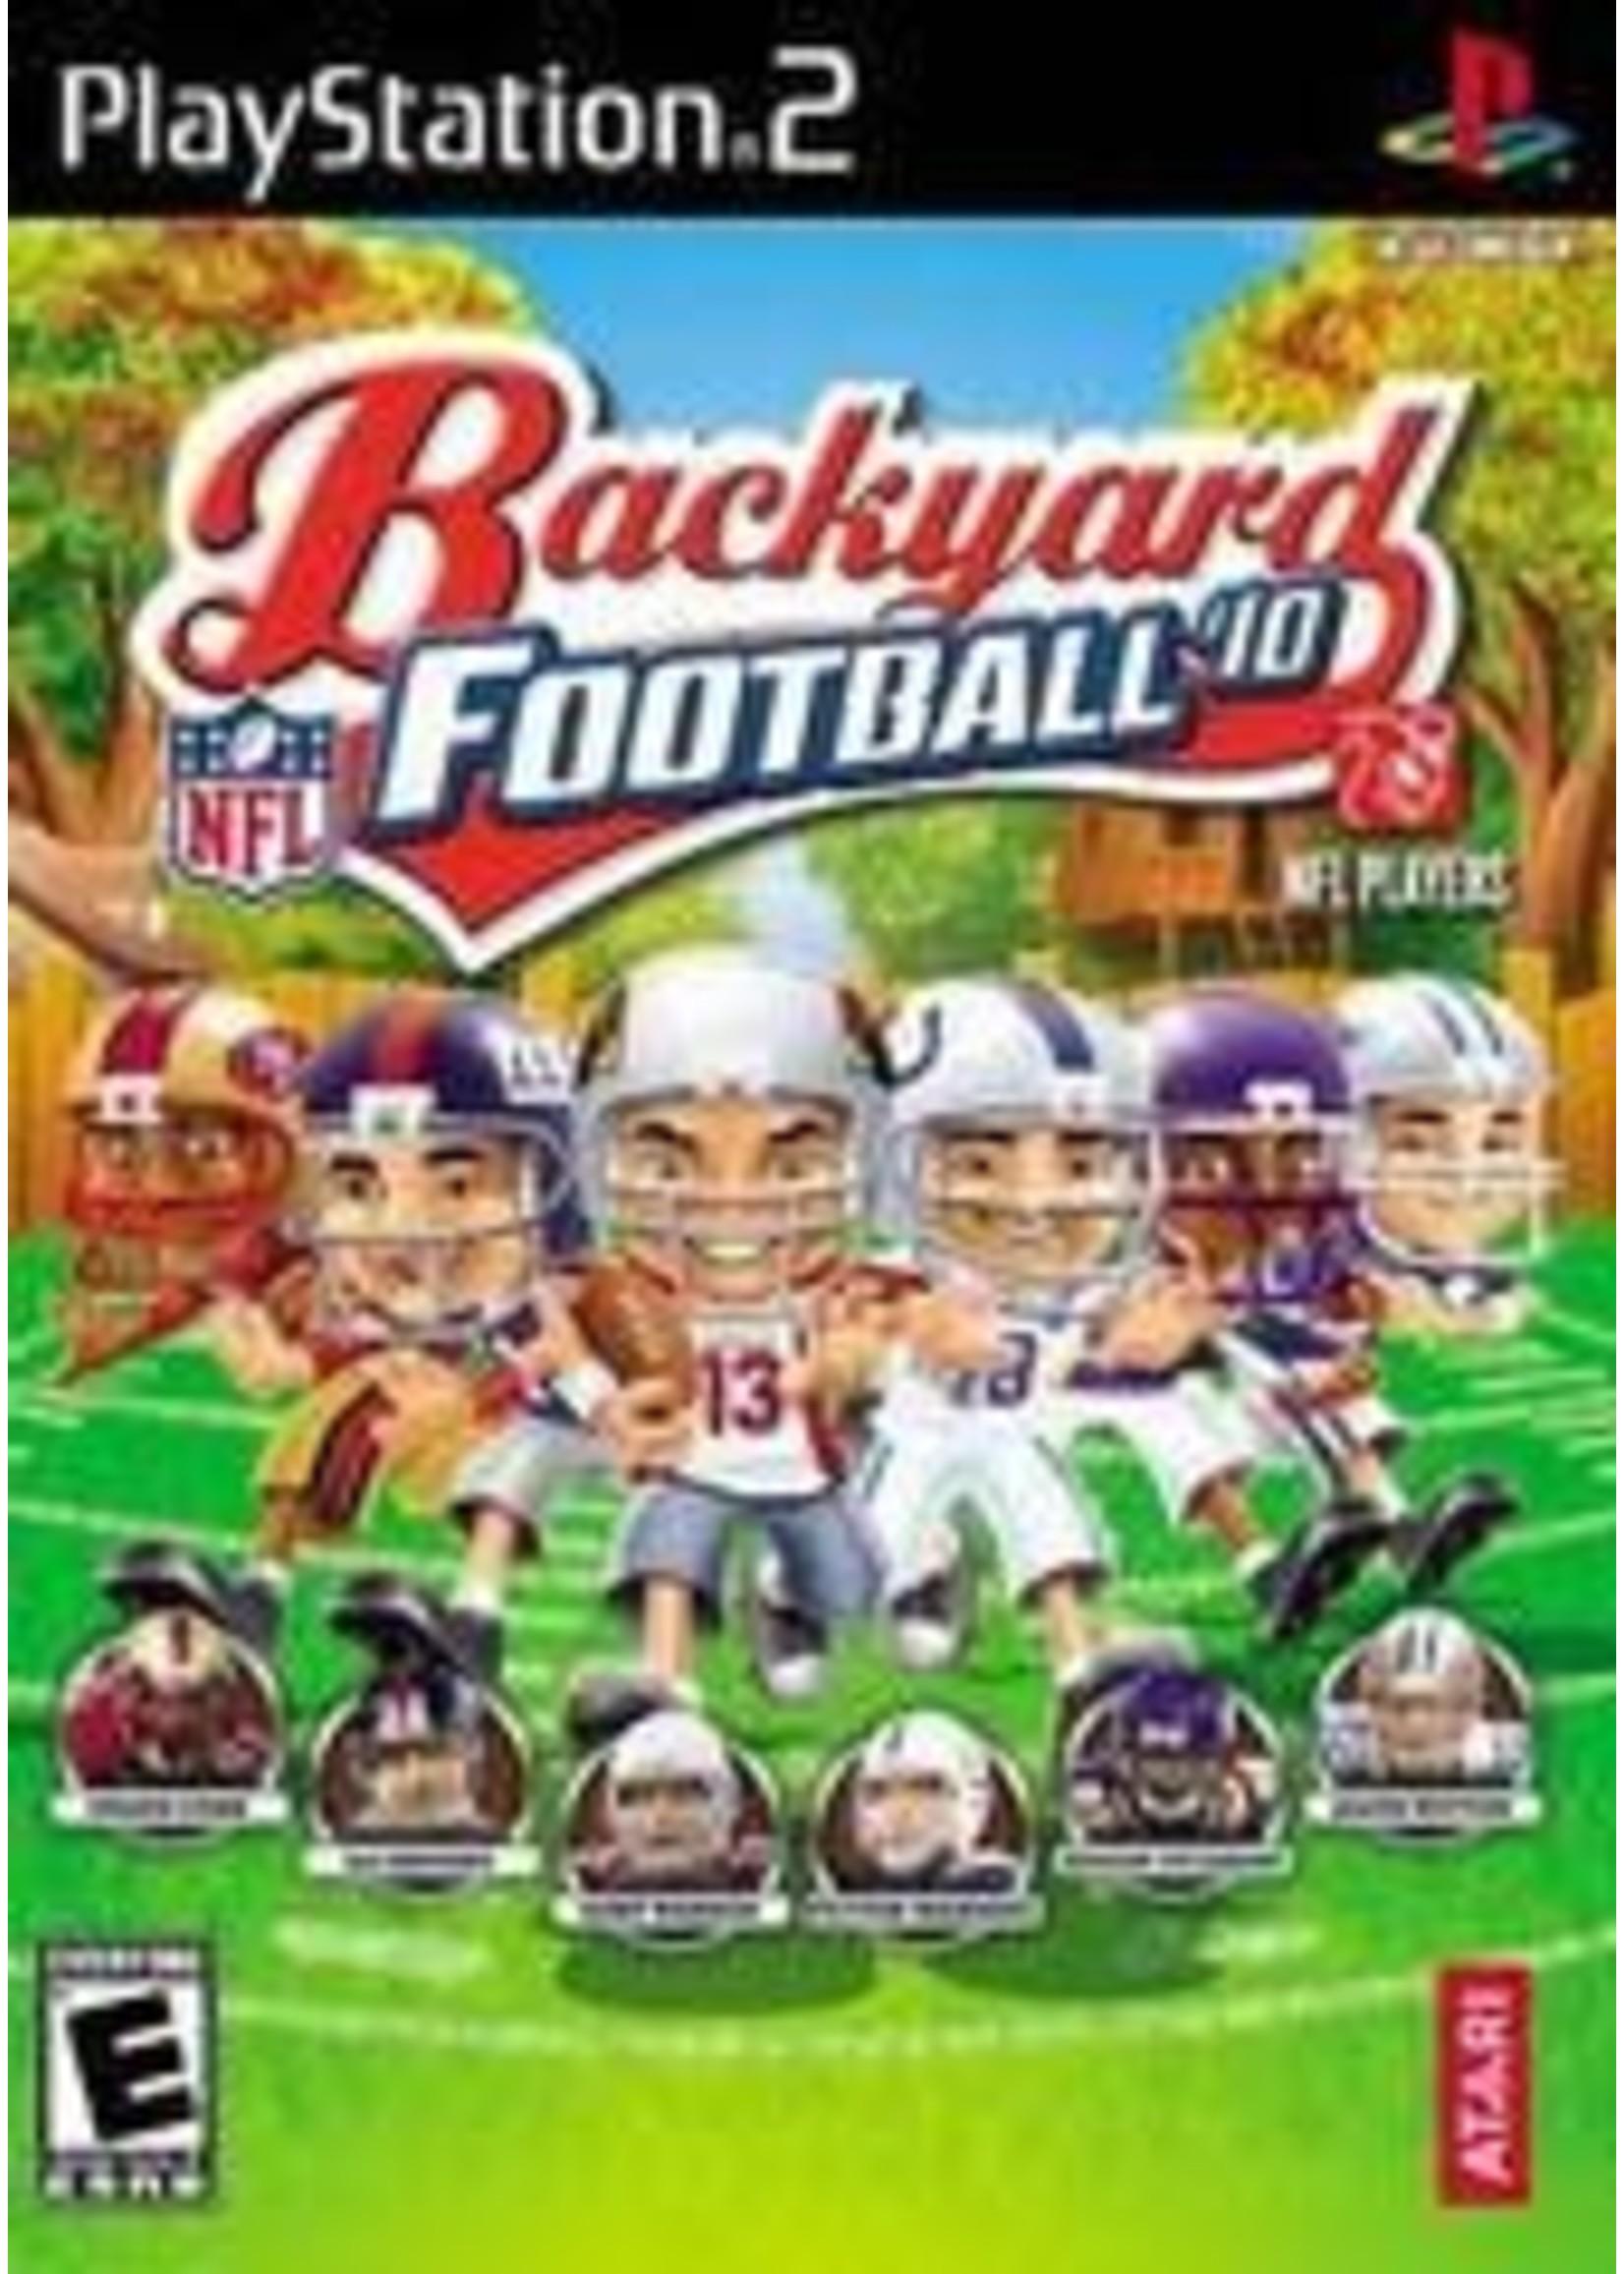 Backyard Football '10 Playstation 2